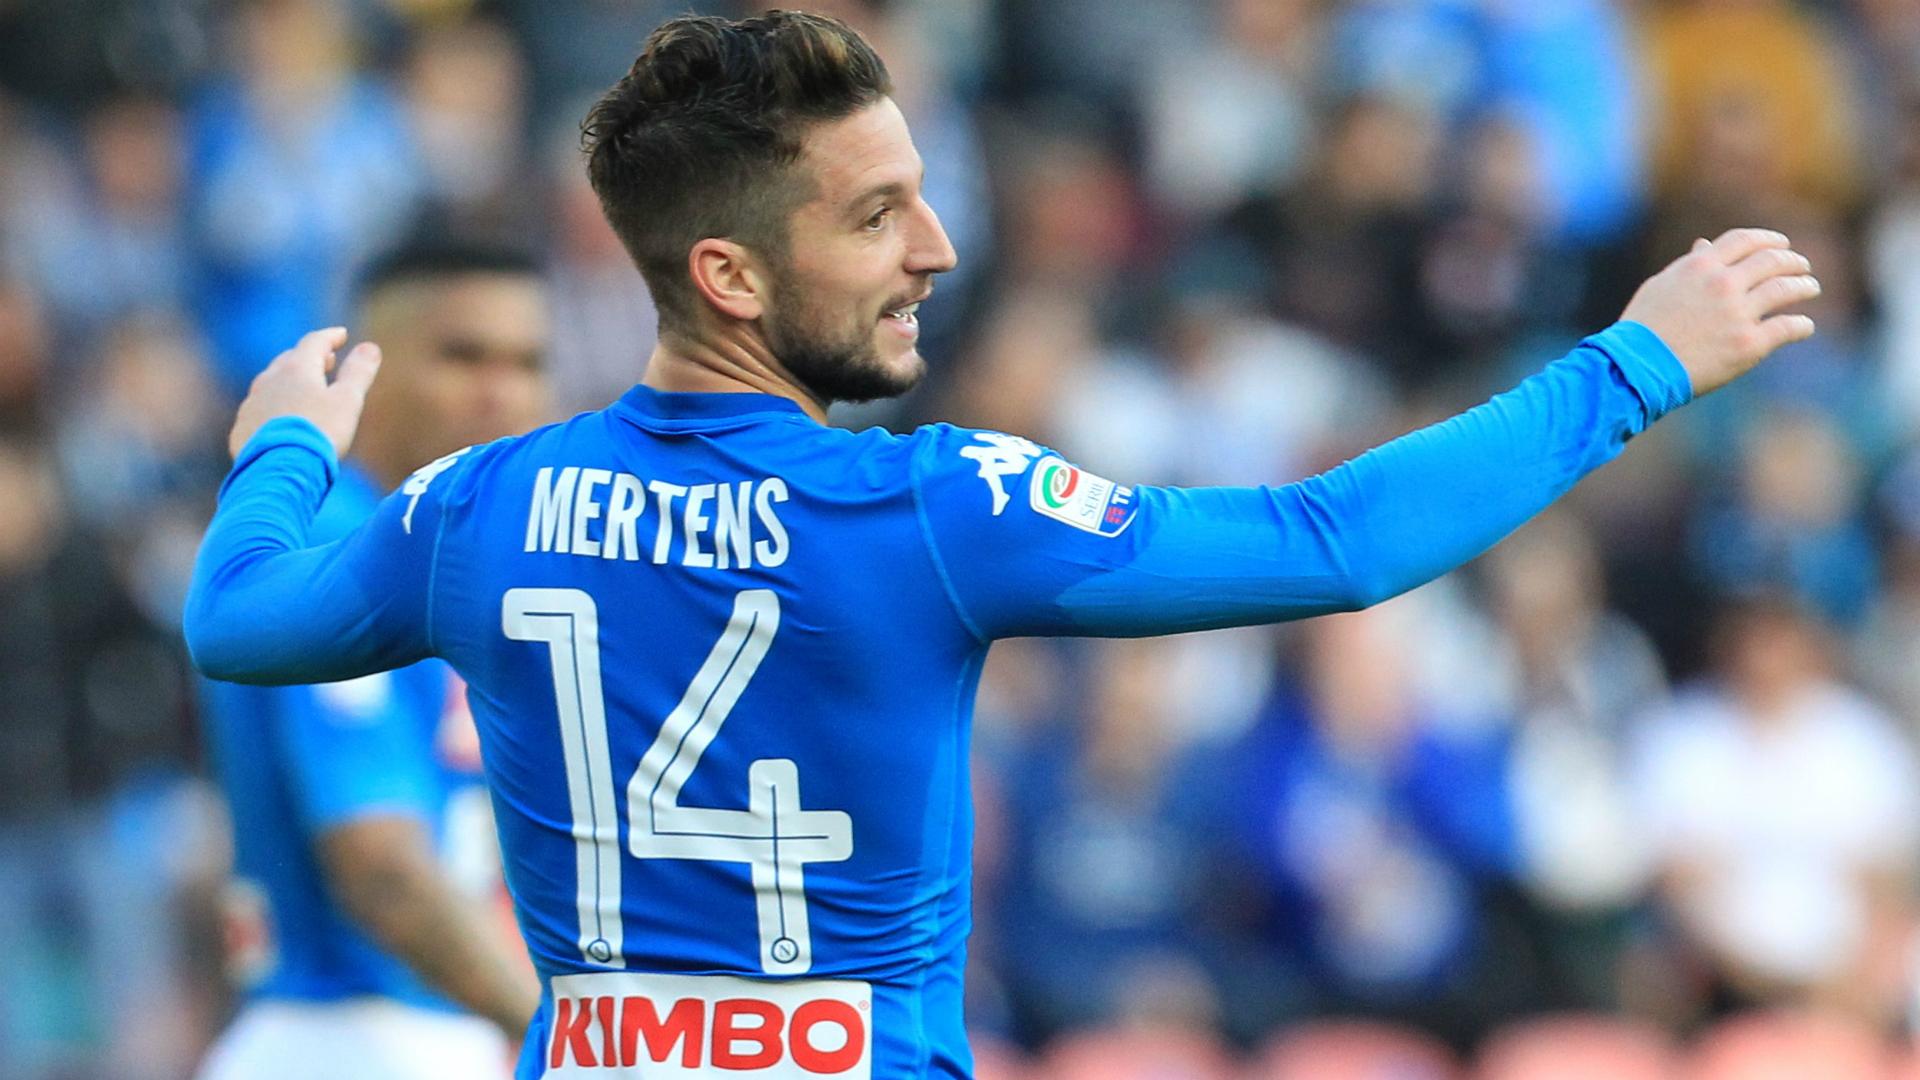 Mertens Napoli Serie A